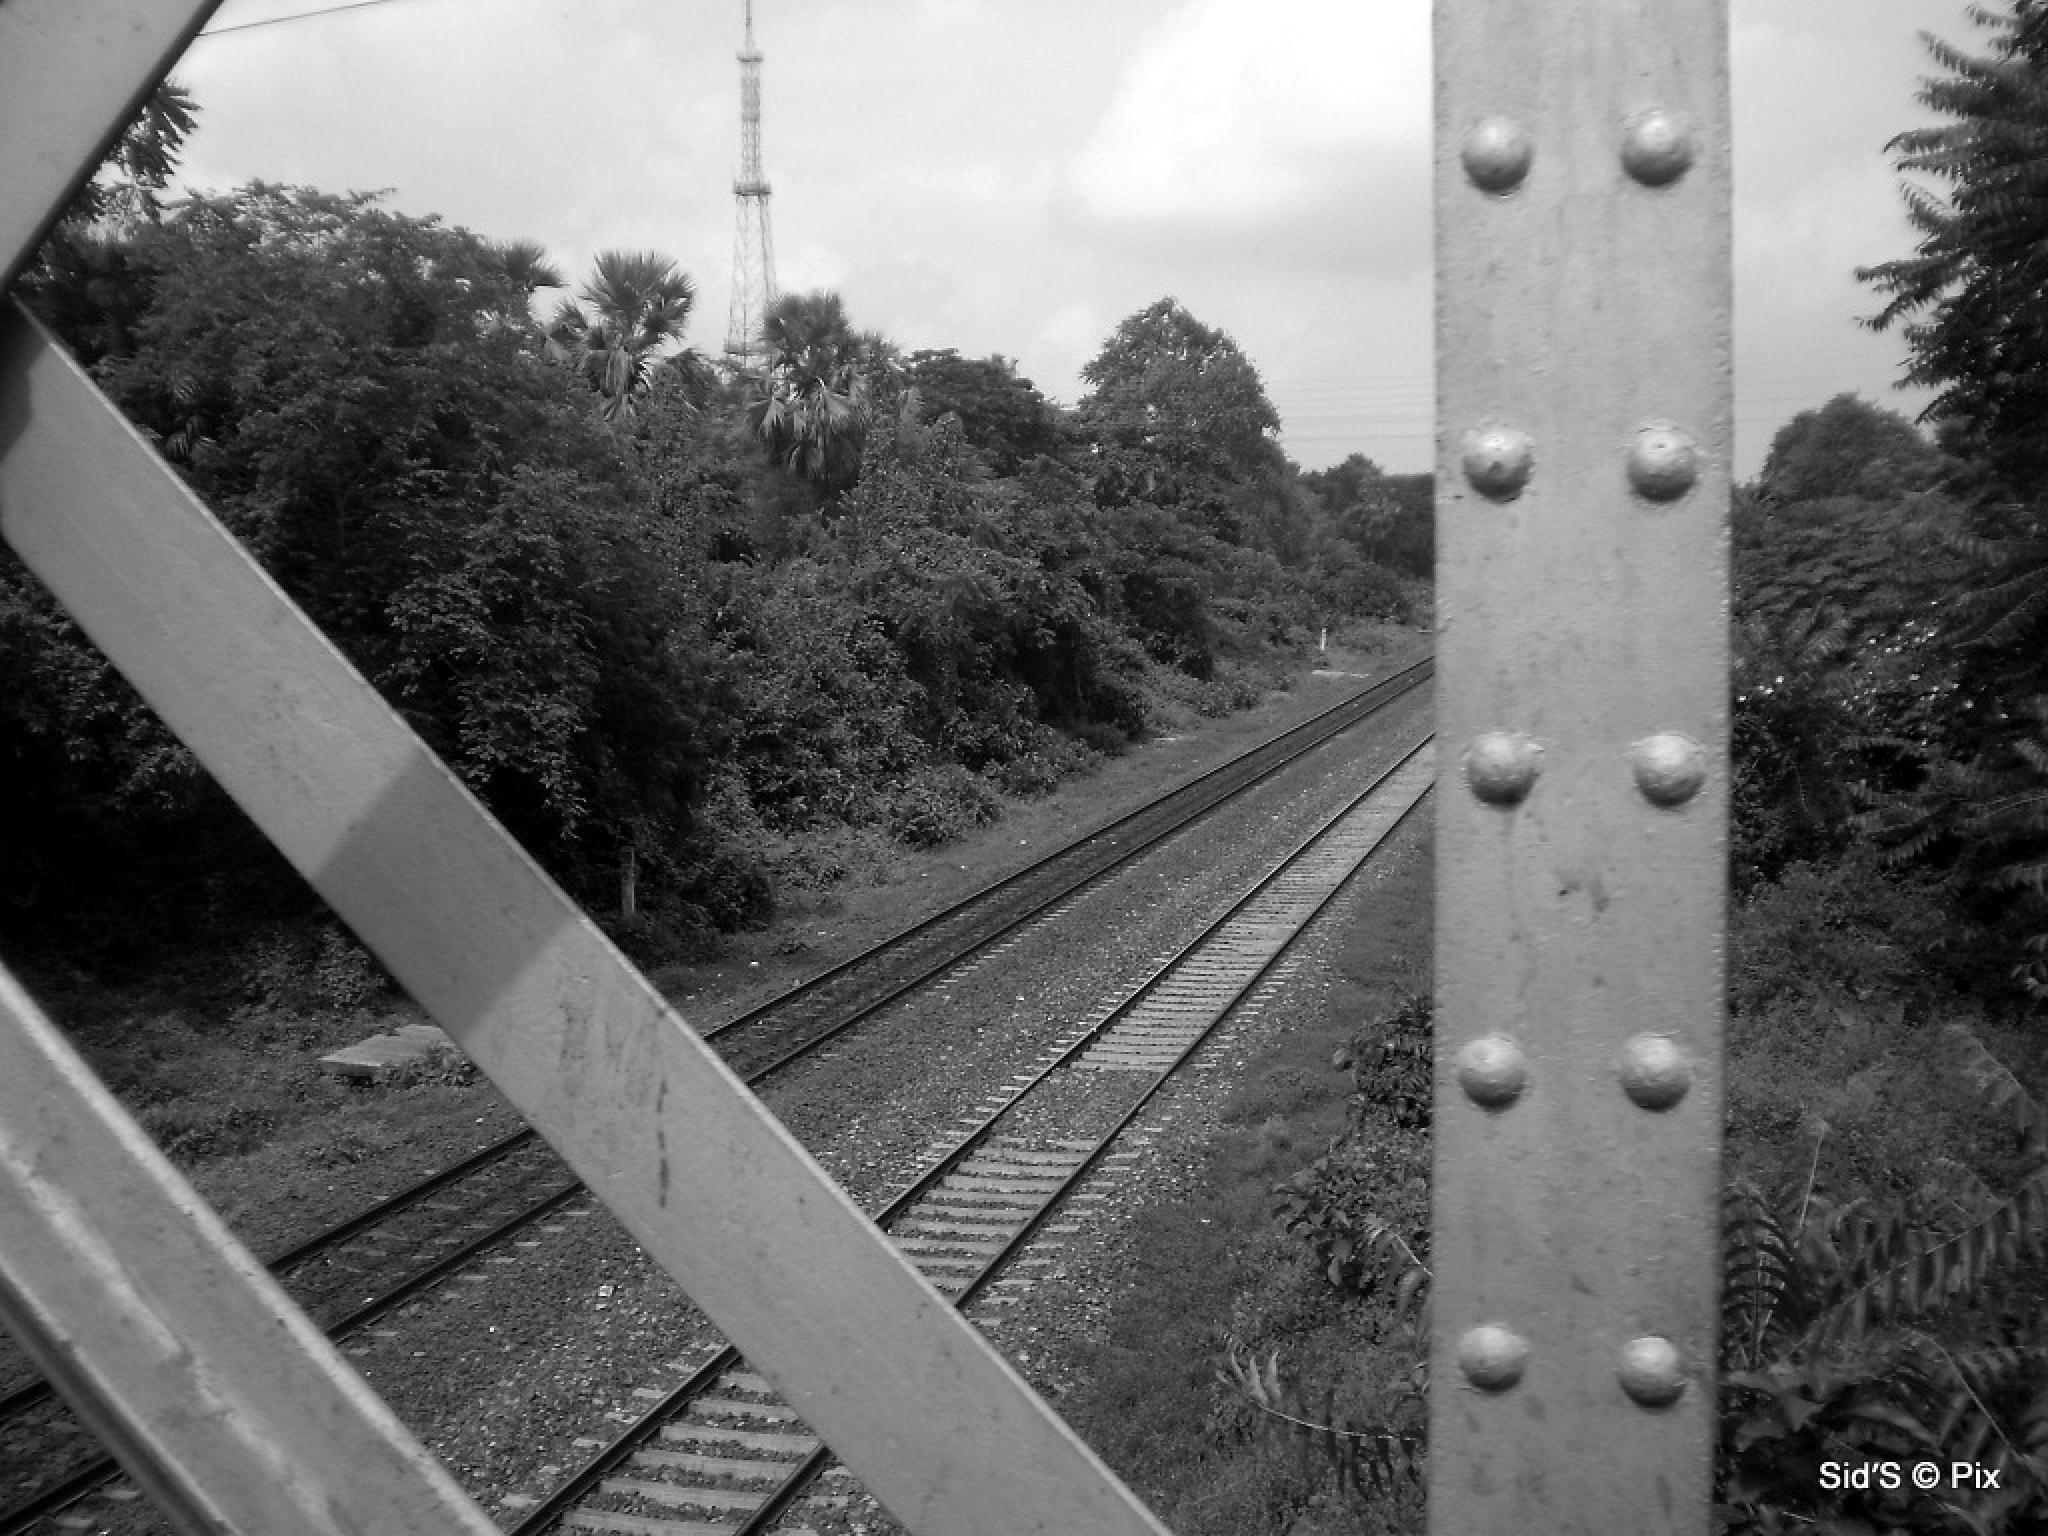 Cross Track by Siddharth Sanyal